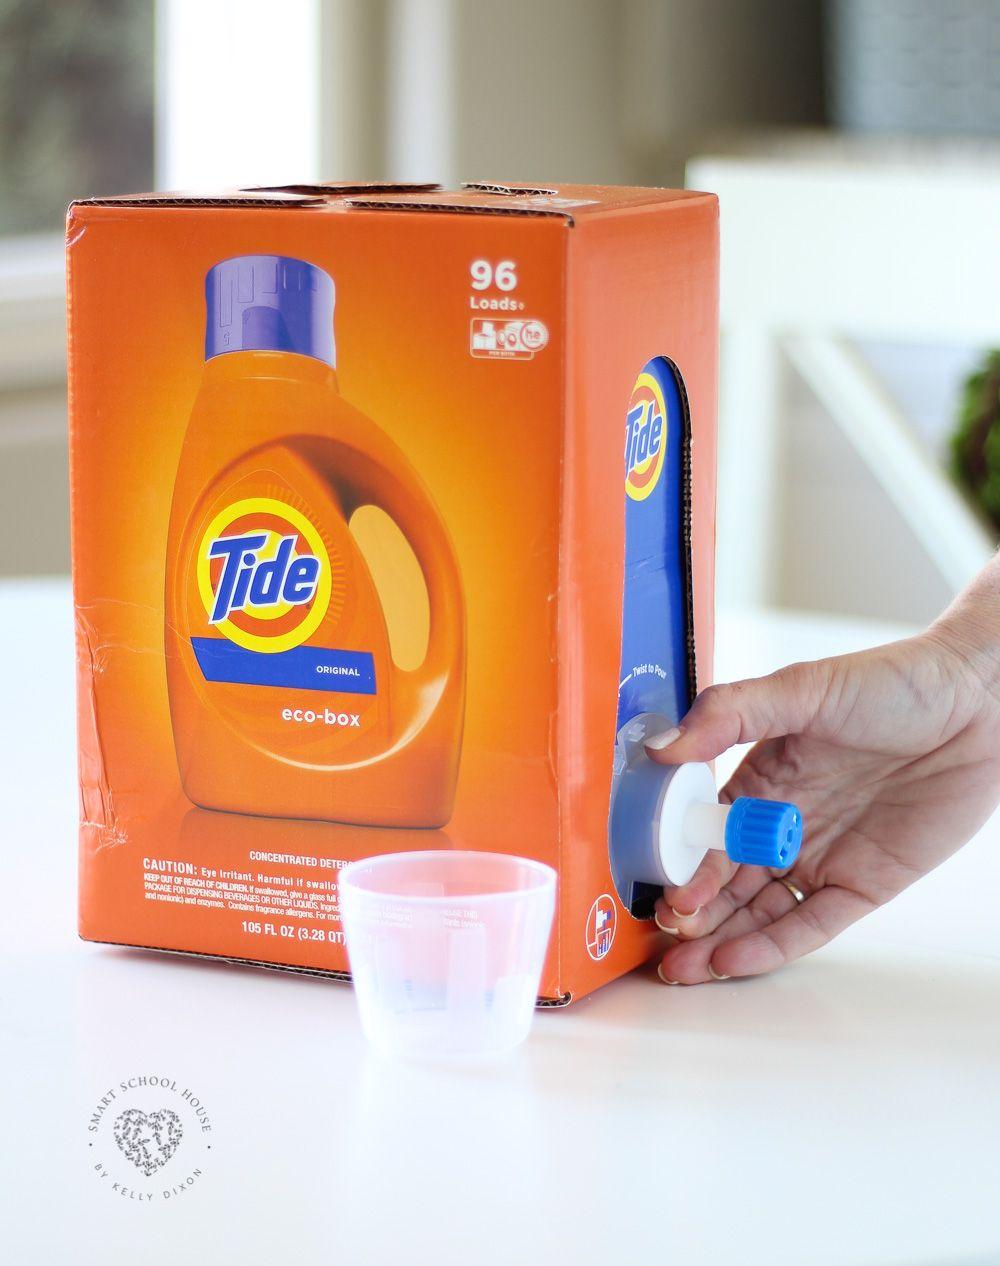 Tide Ecobox Original He 96 Loads Liquid Laundry Detergent 105 Fl